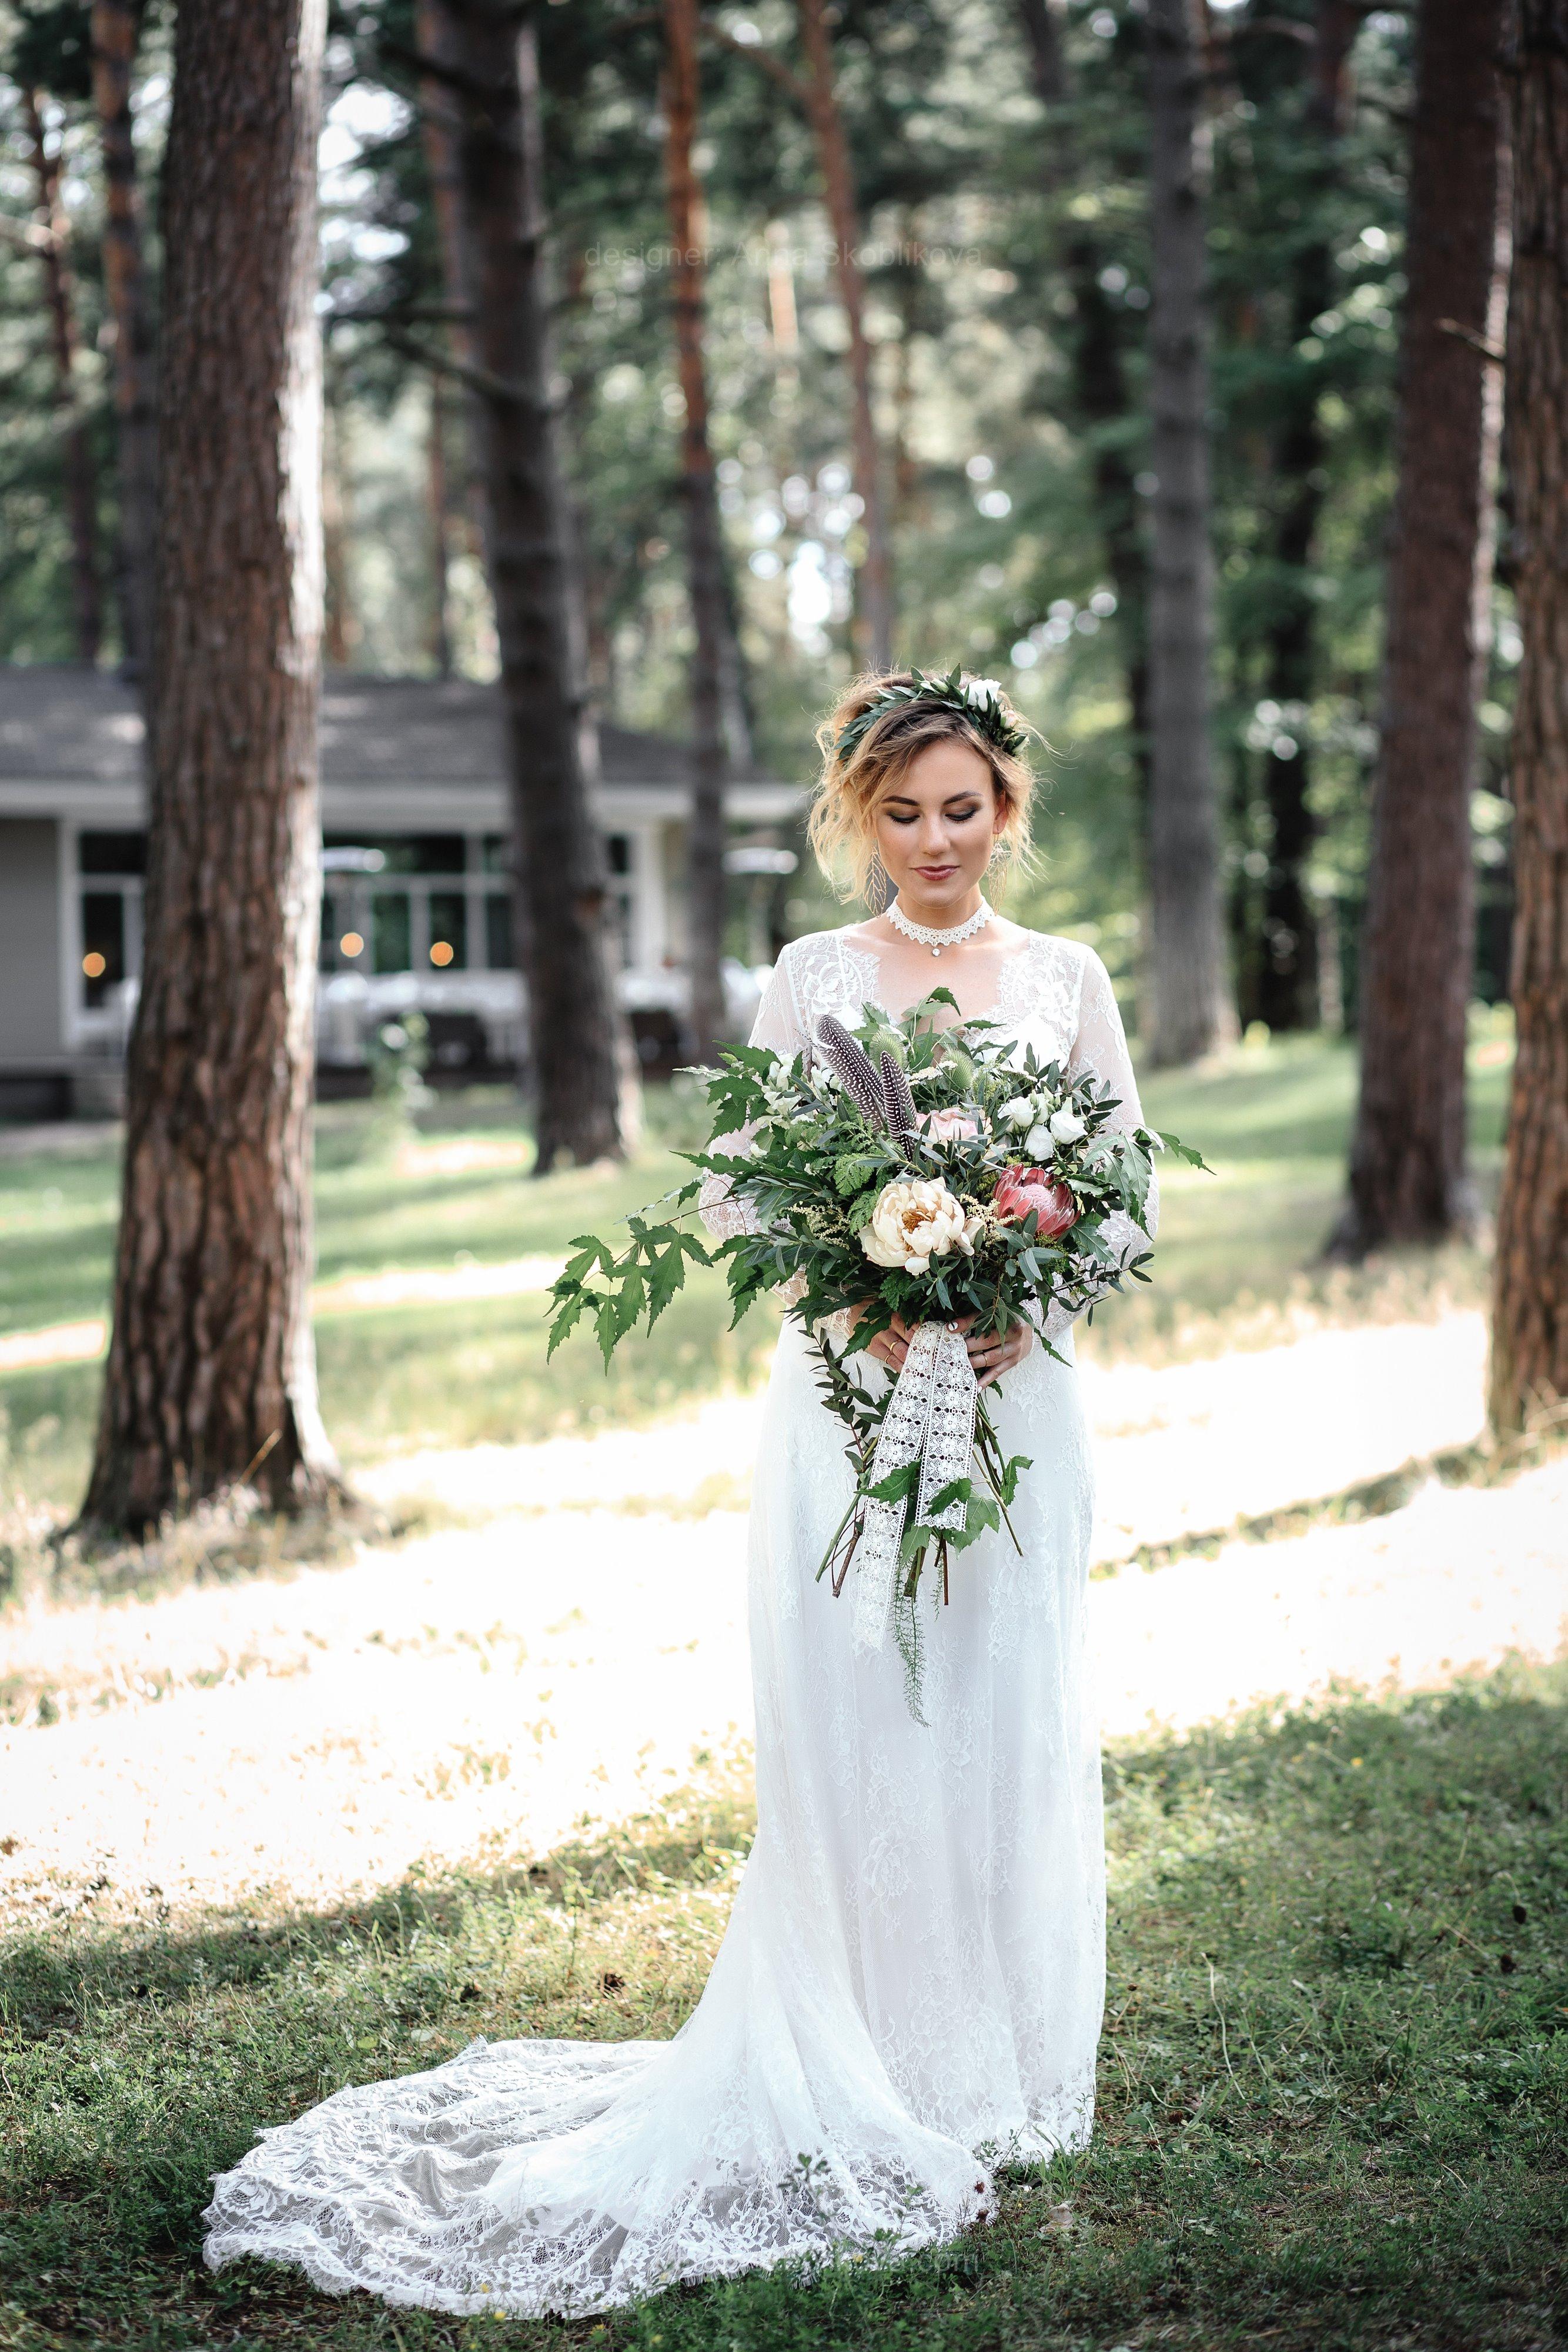 Lace wedding Dress - Anna Skoblikova